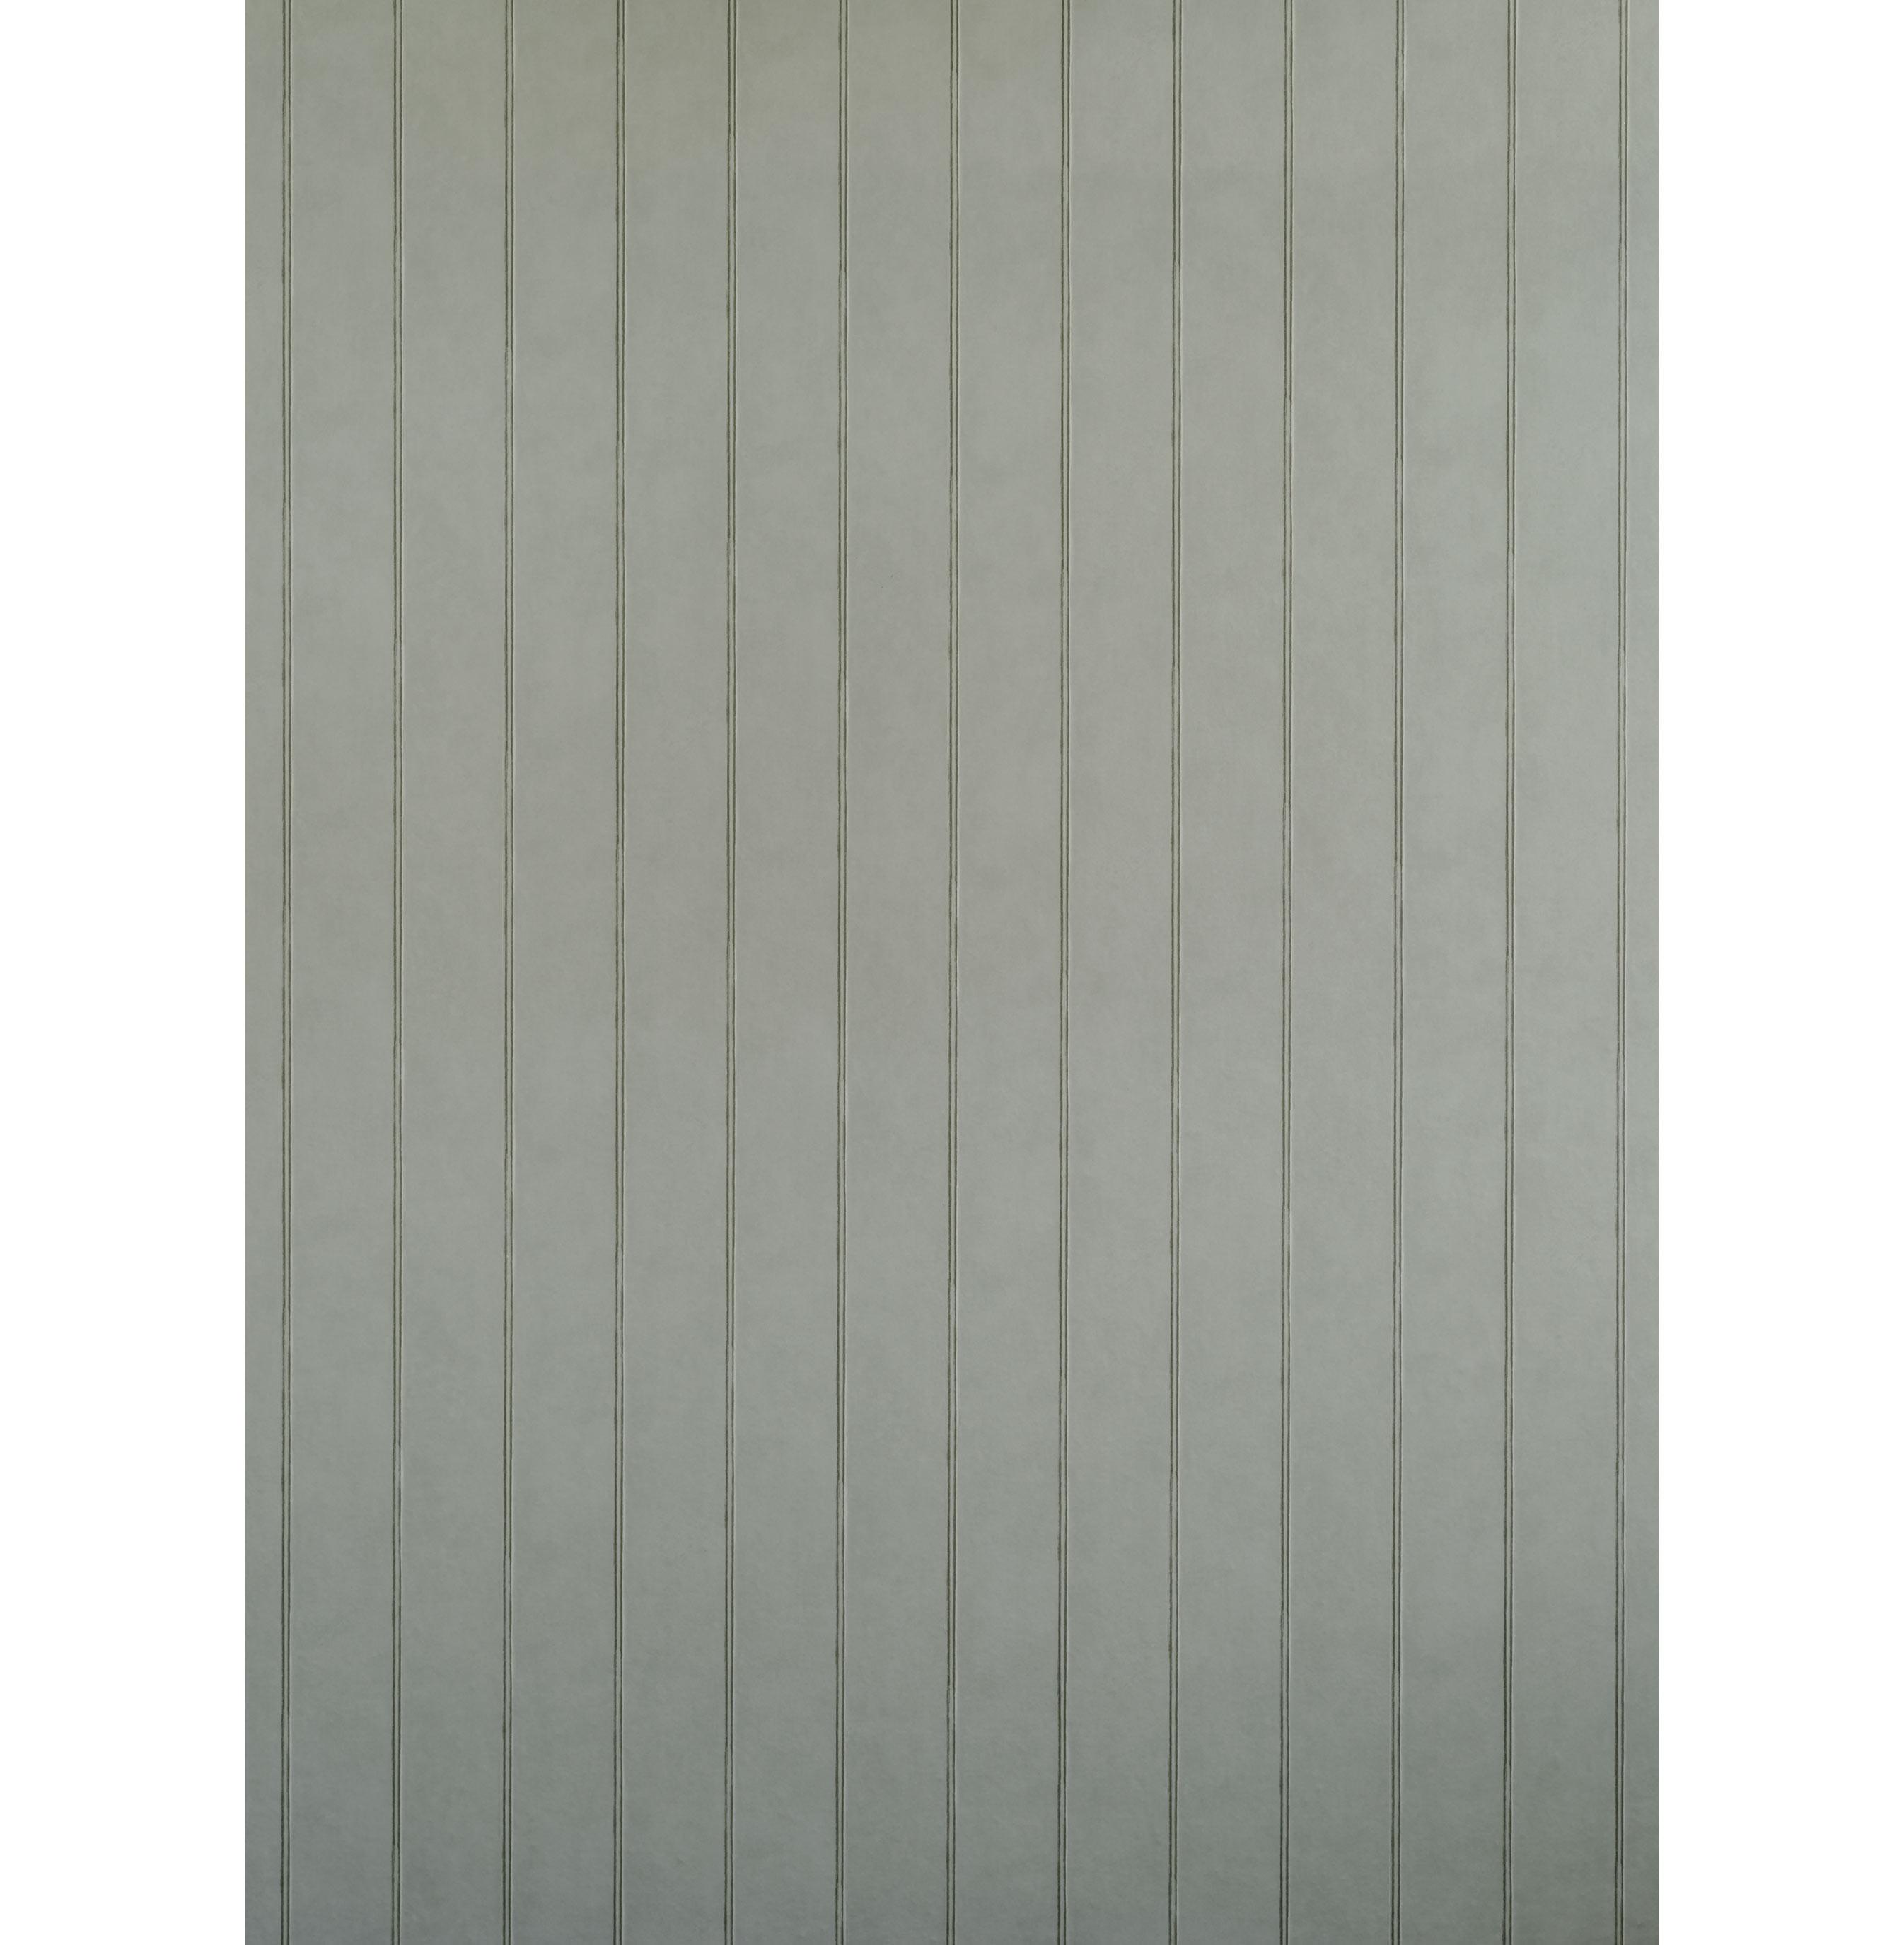 Tongue Groove Wood Panel Rustic Wallpaper - Charcoal - 2 Rolls